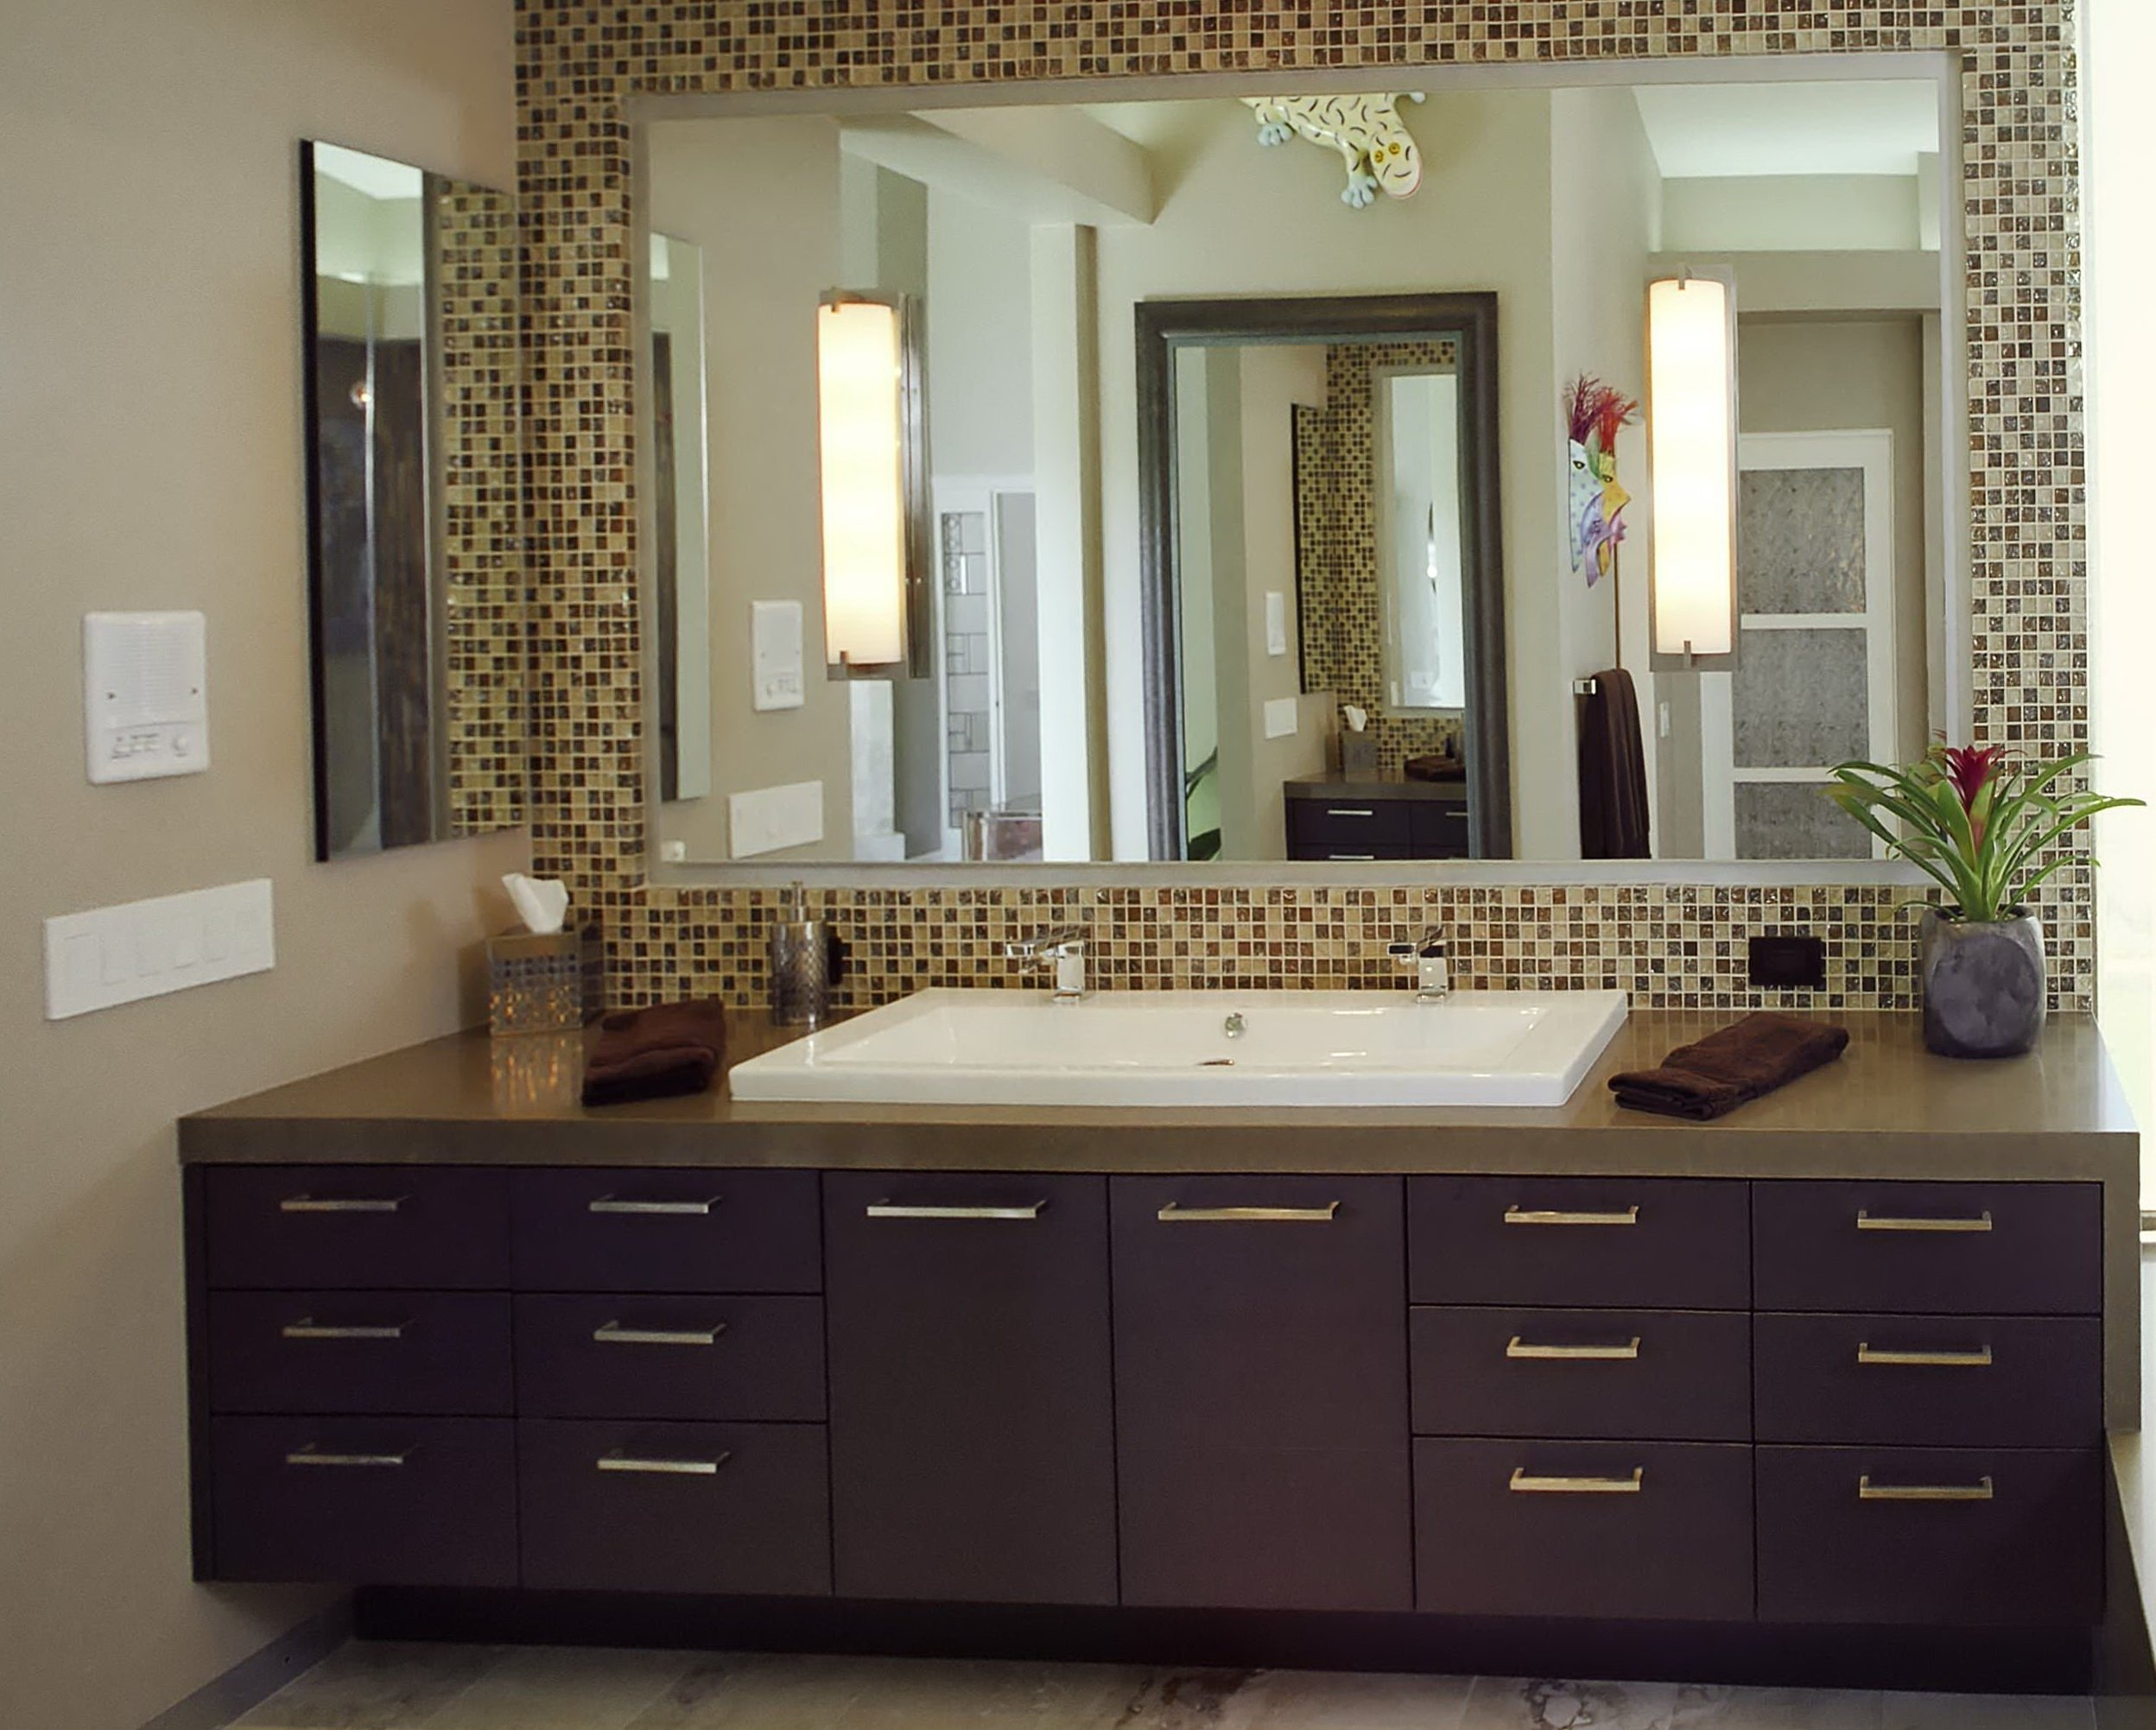 10 Lovable Diy Bathroom Mirror Frame Ideas diy tile framed bathroom mirror e280a2 bathroom mirrors ideas 2020